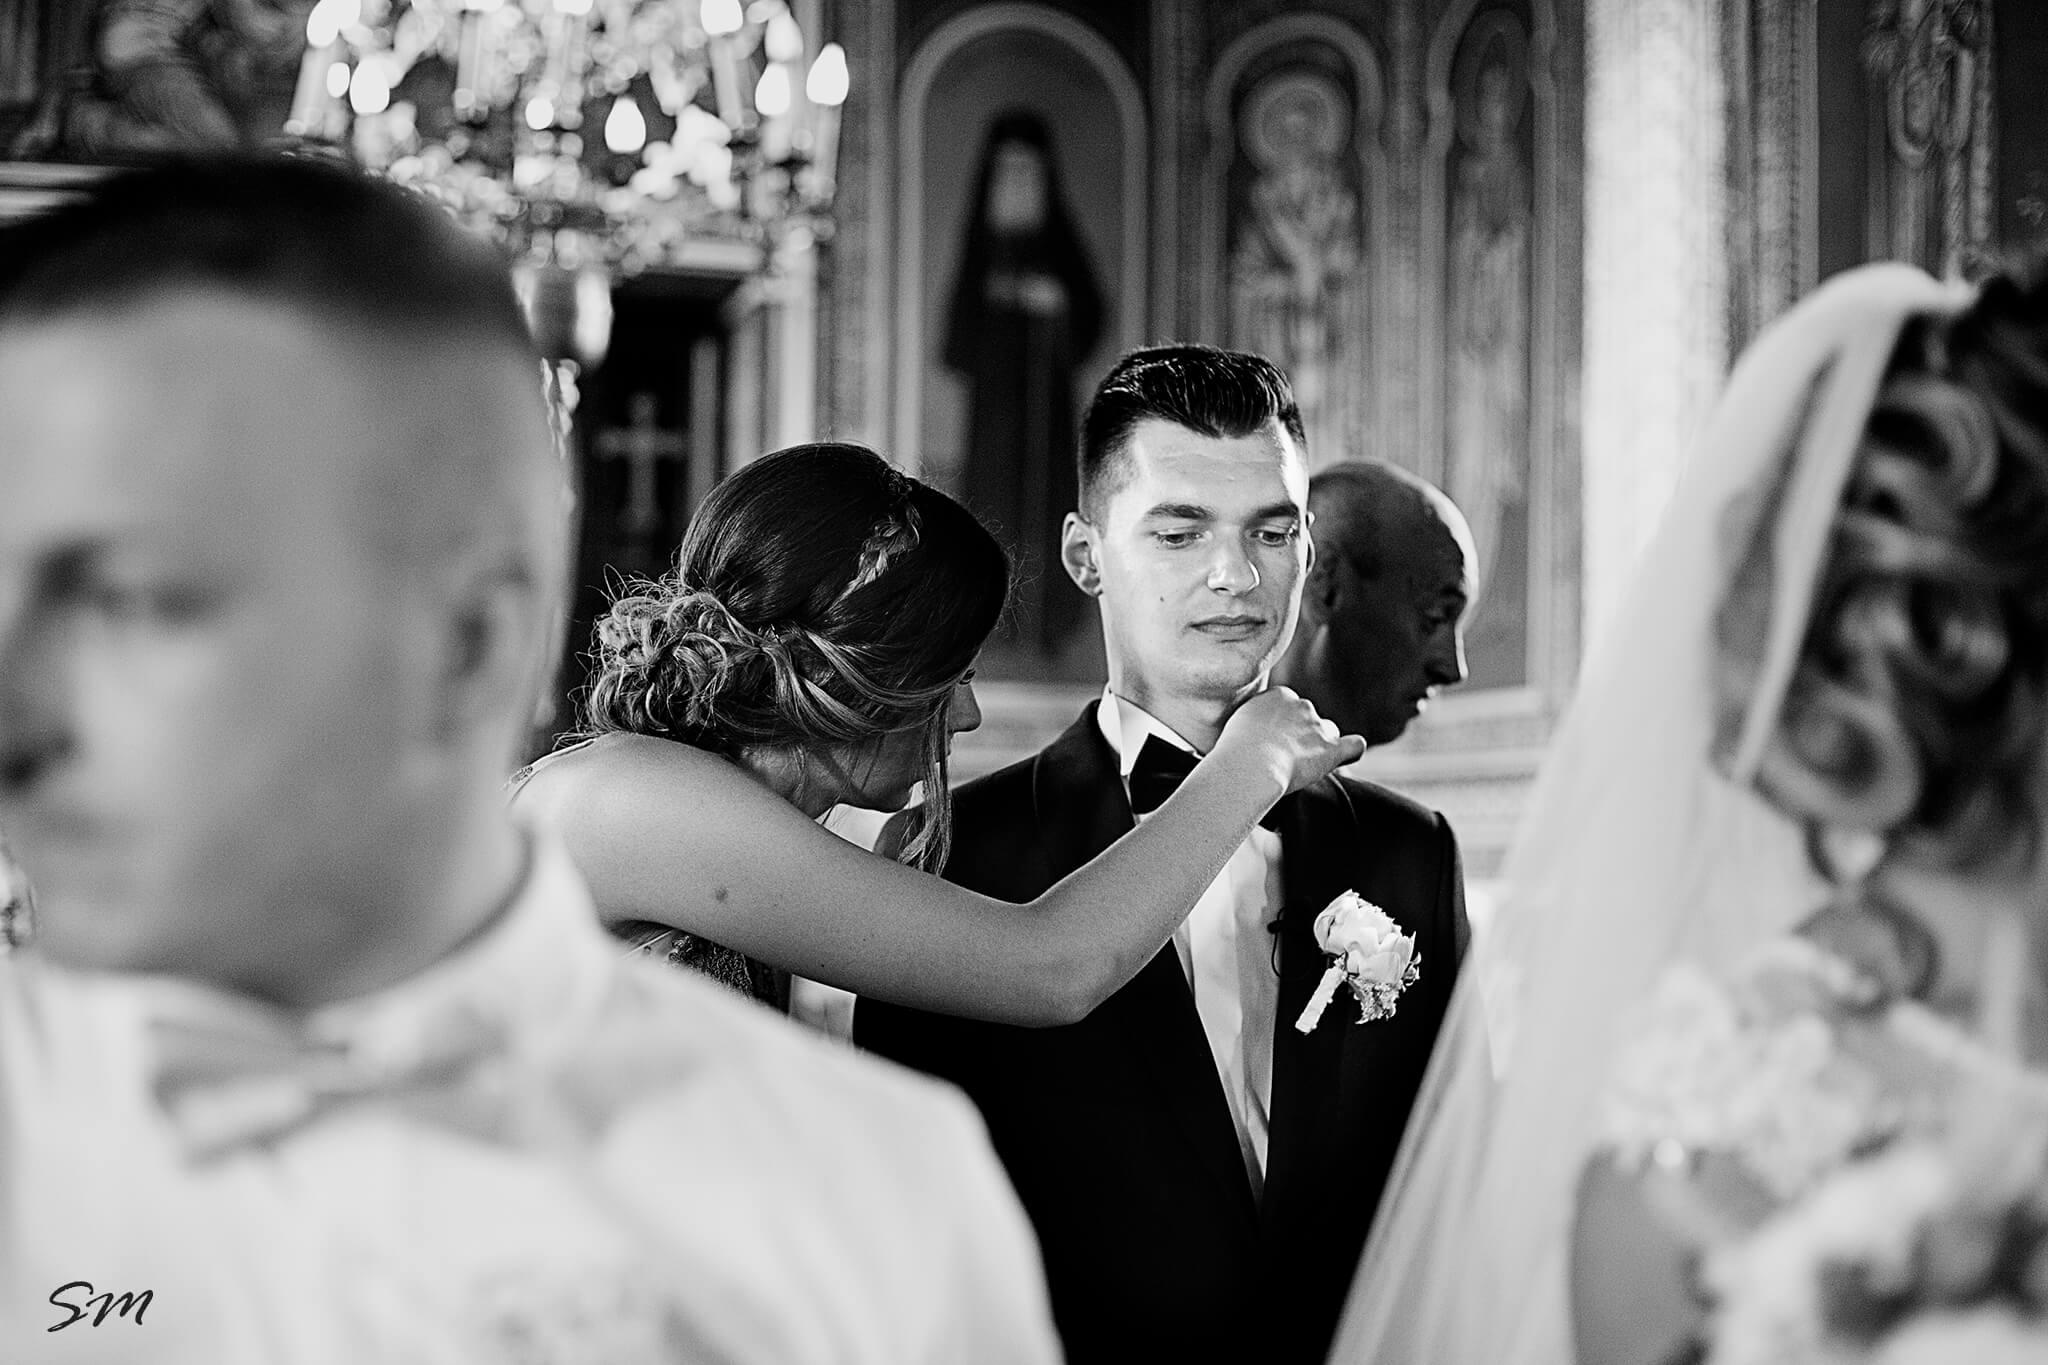 fotograf_nunta_profesionist_suceava (29)